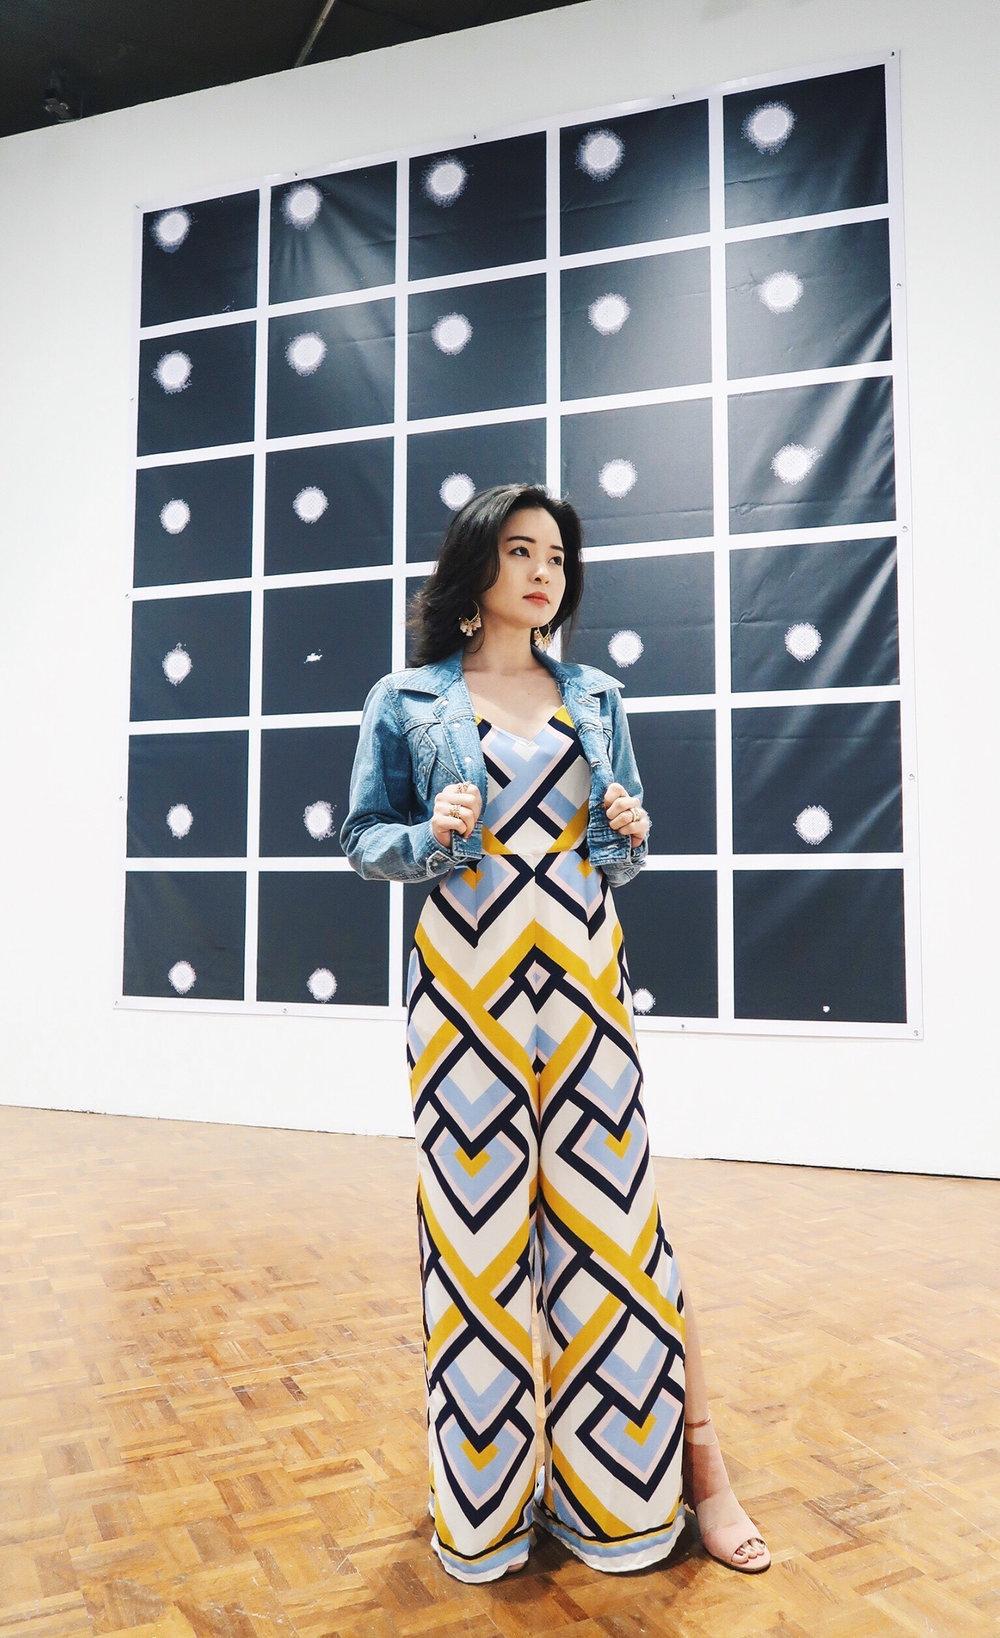 Divine Tio Sunstruck UH MFA 2018